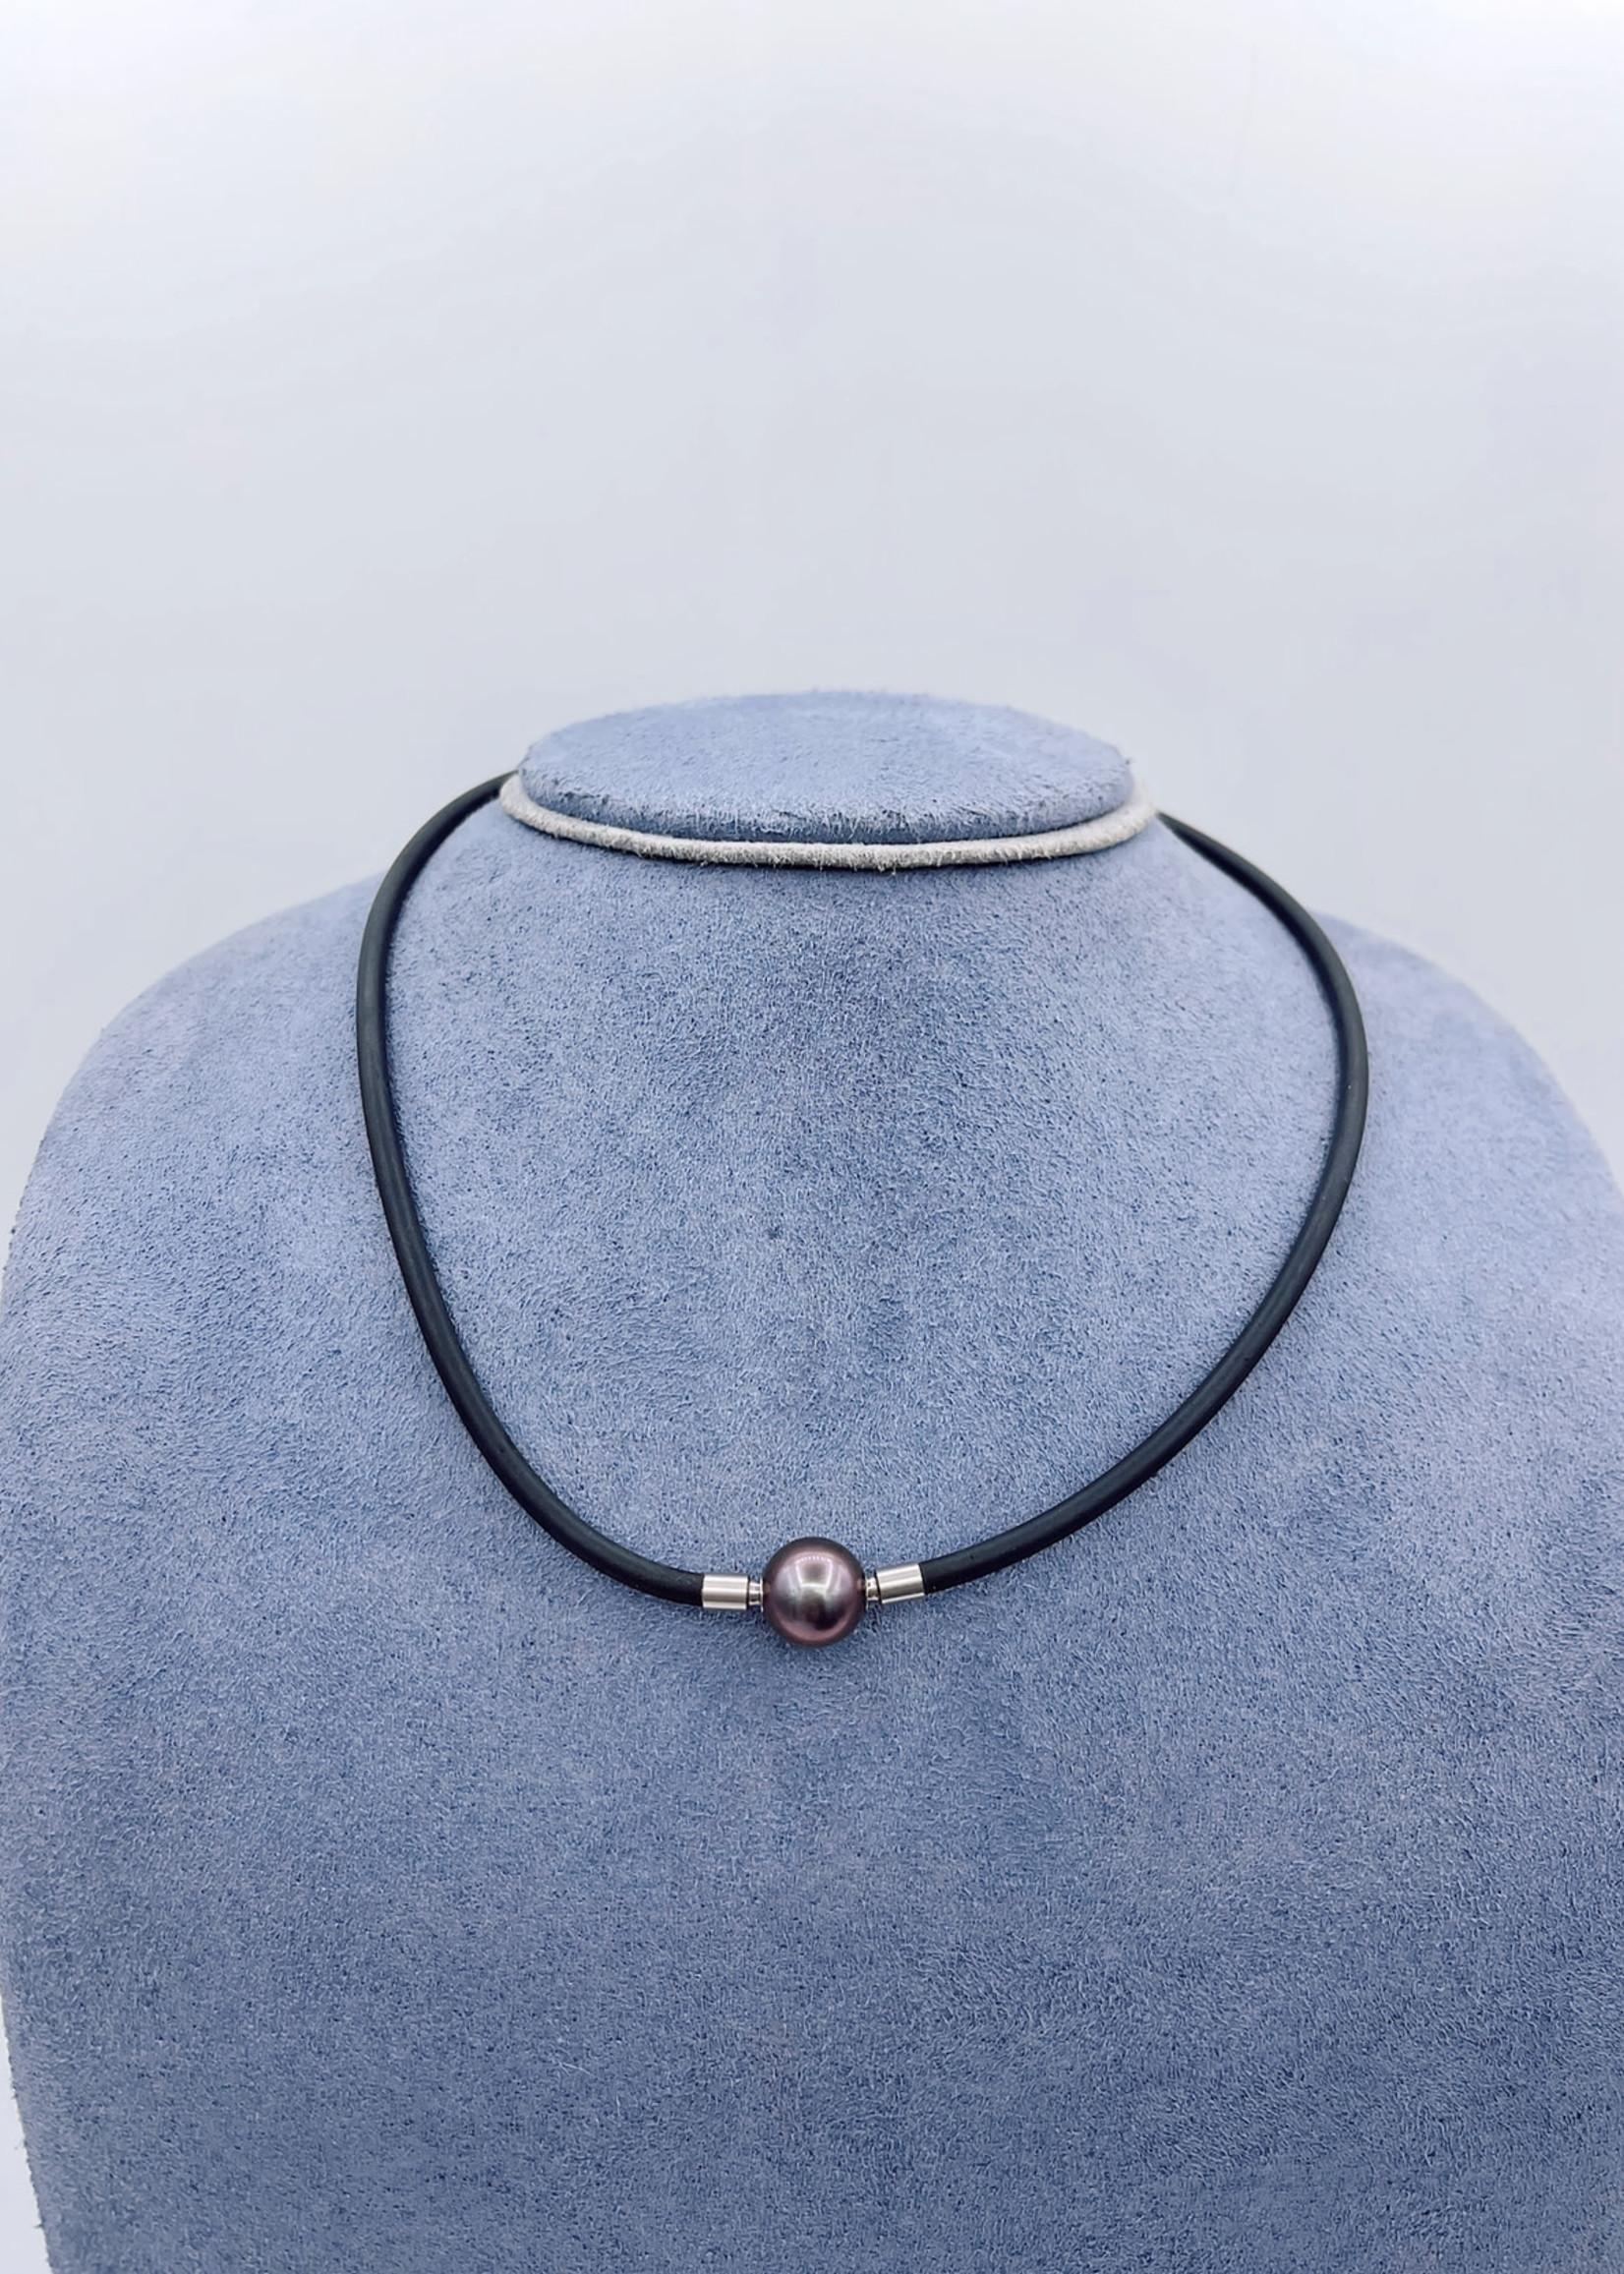 CJ Designs Tahitian Pearl Necklace